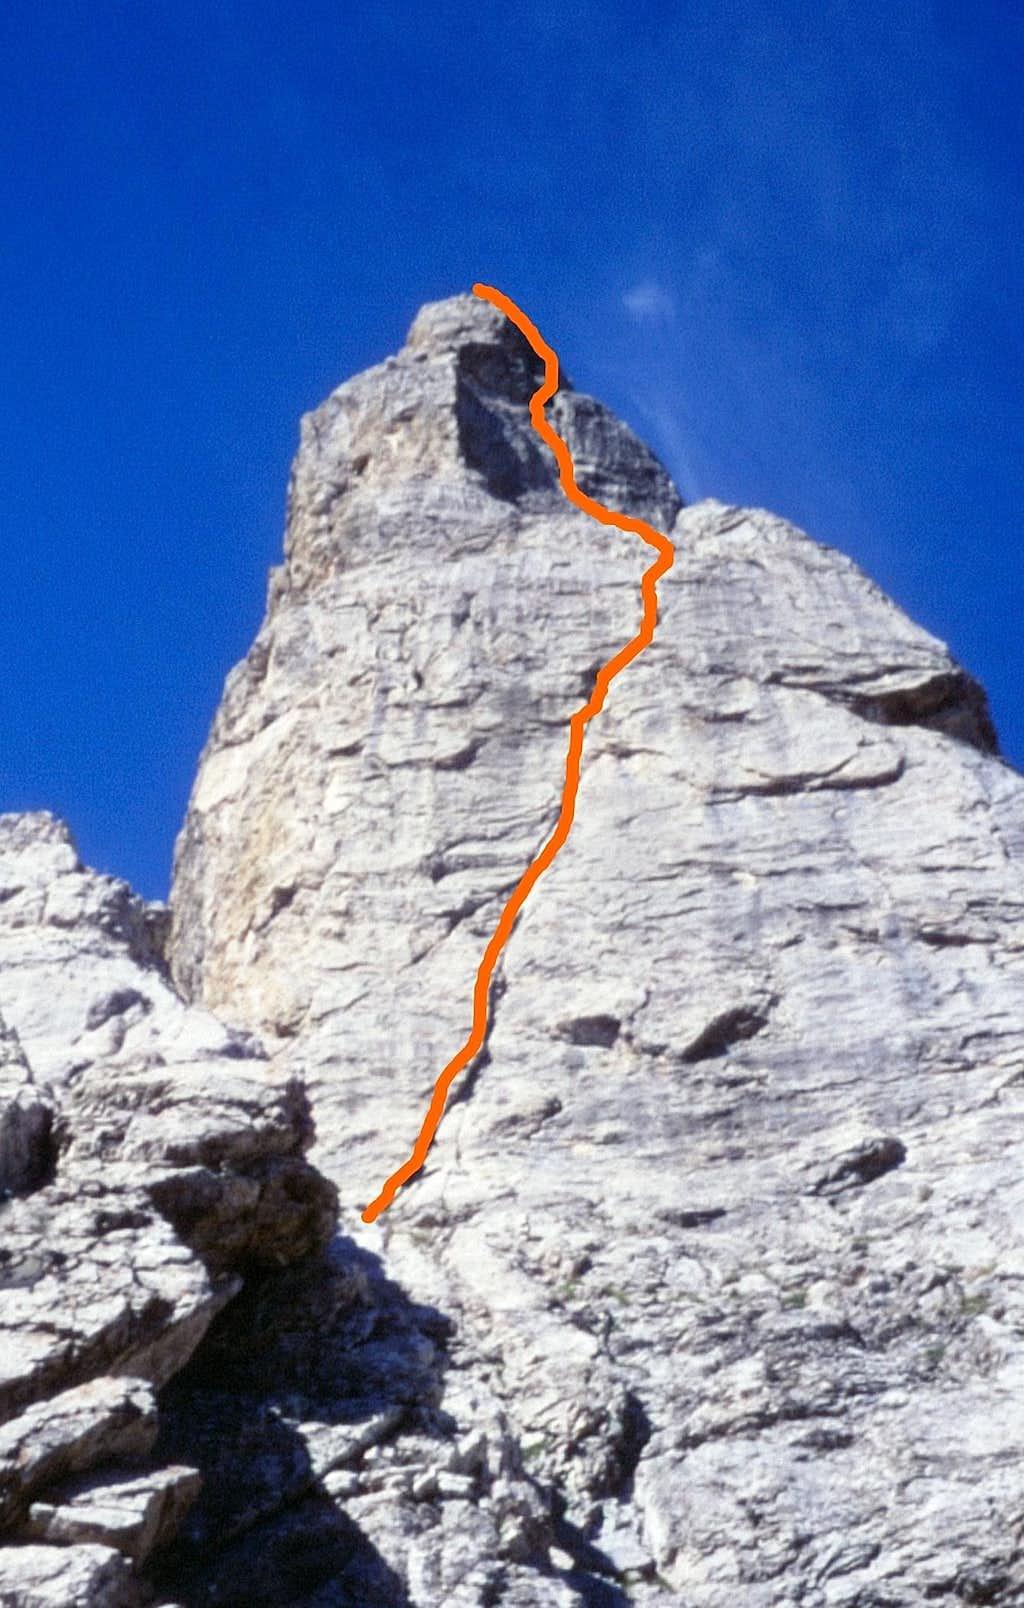 Tenailles de Montbrison - Eperon Renaud upper needle topo